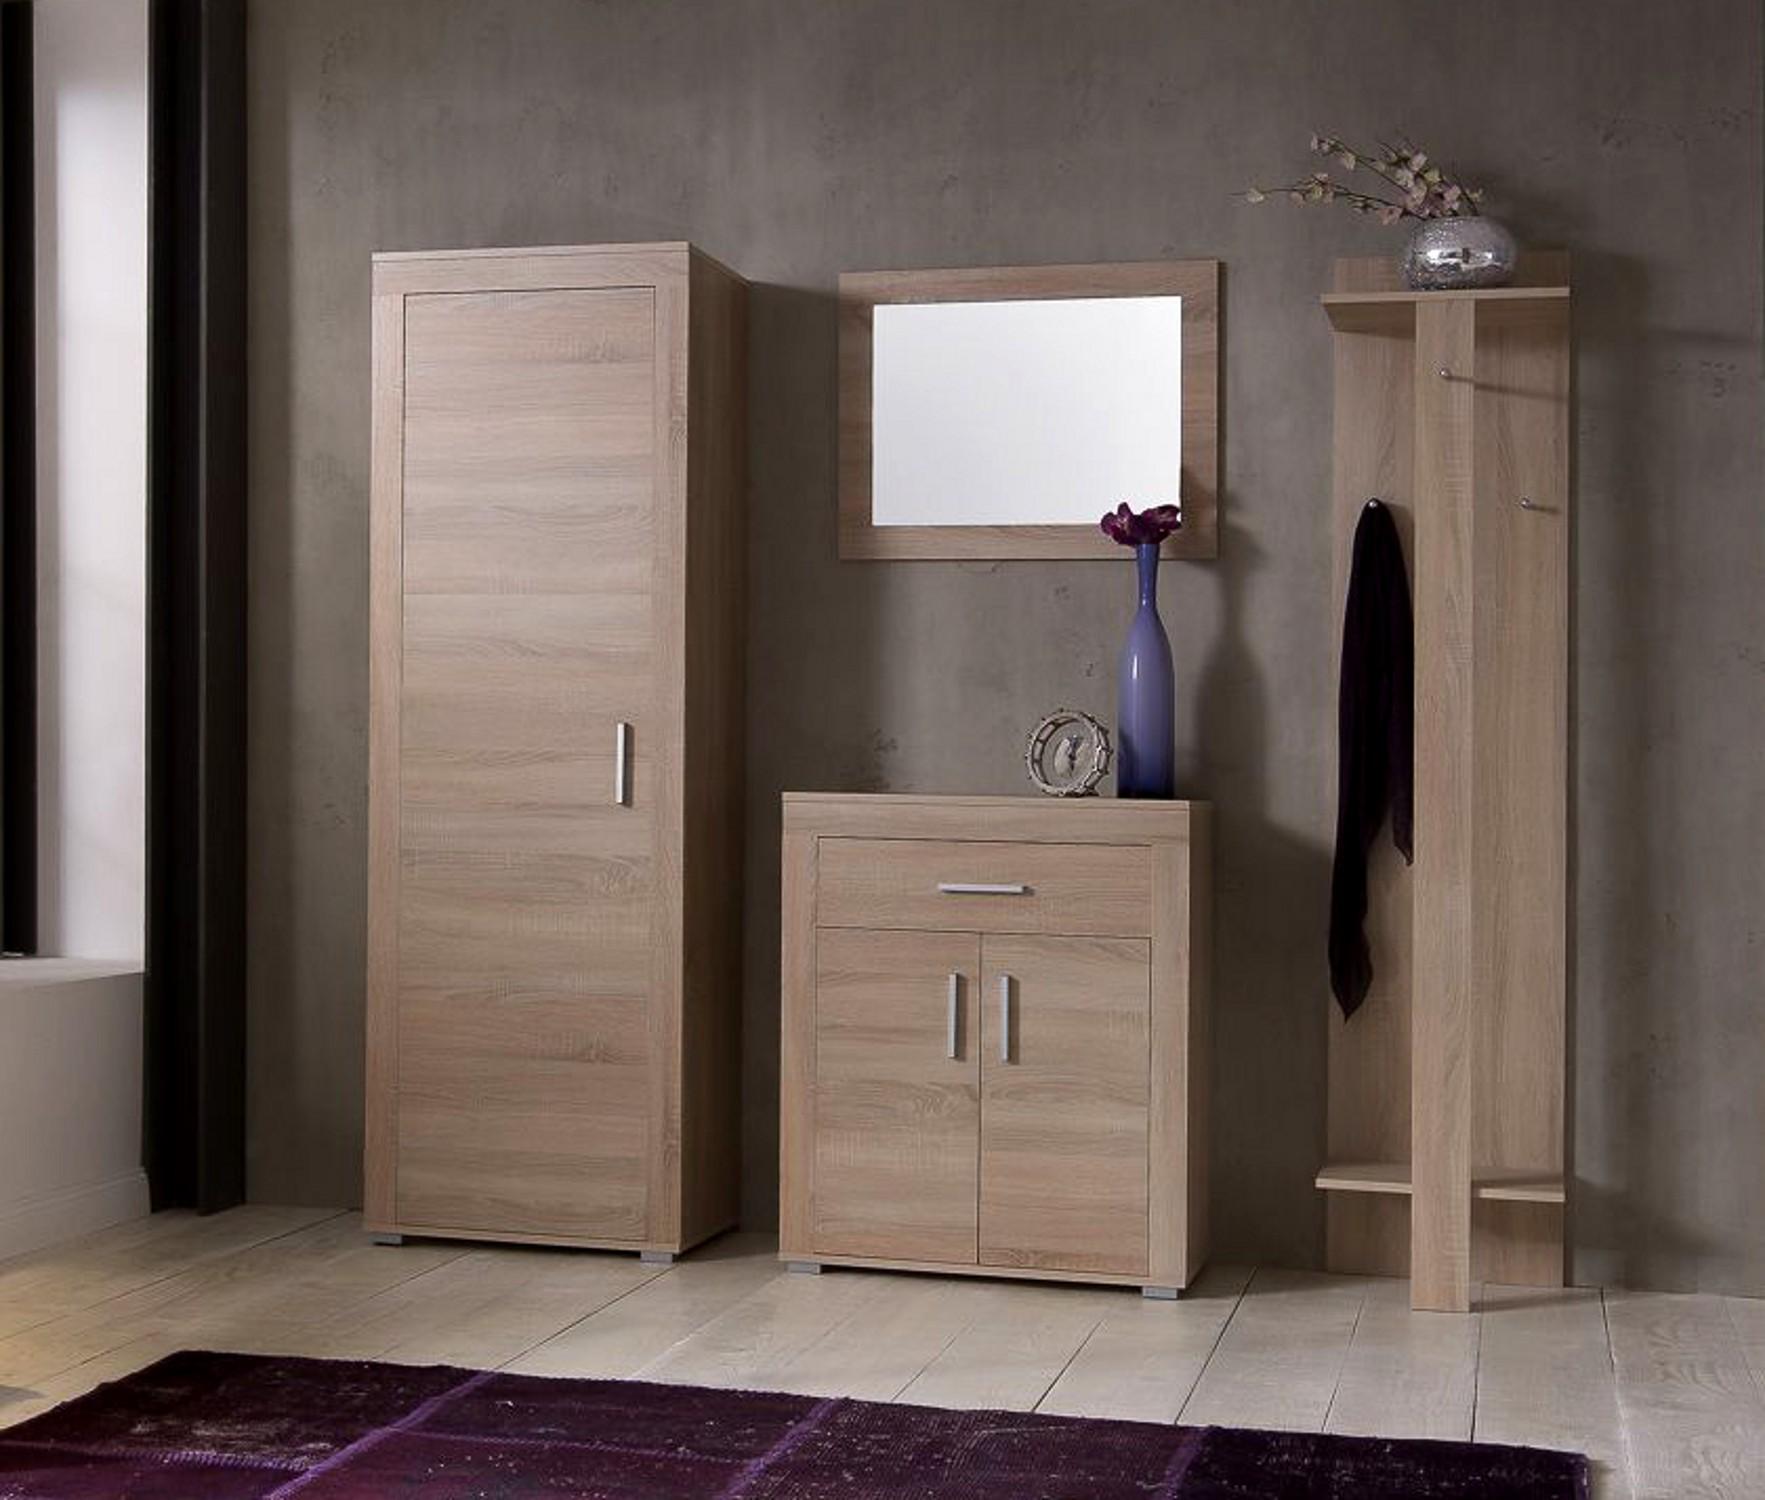 garderobenset lake 170 cm breit 4 teilig eiche sonoma. Black Bedroom Furniture Sets. Home Design Ideas